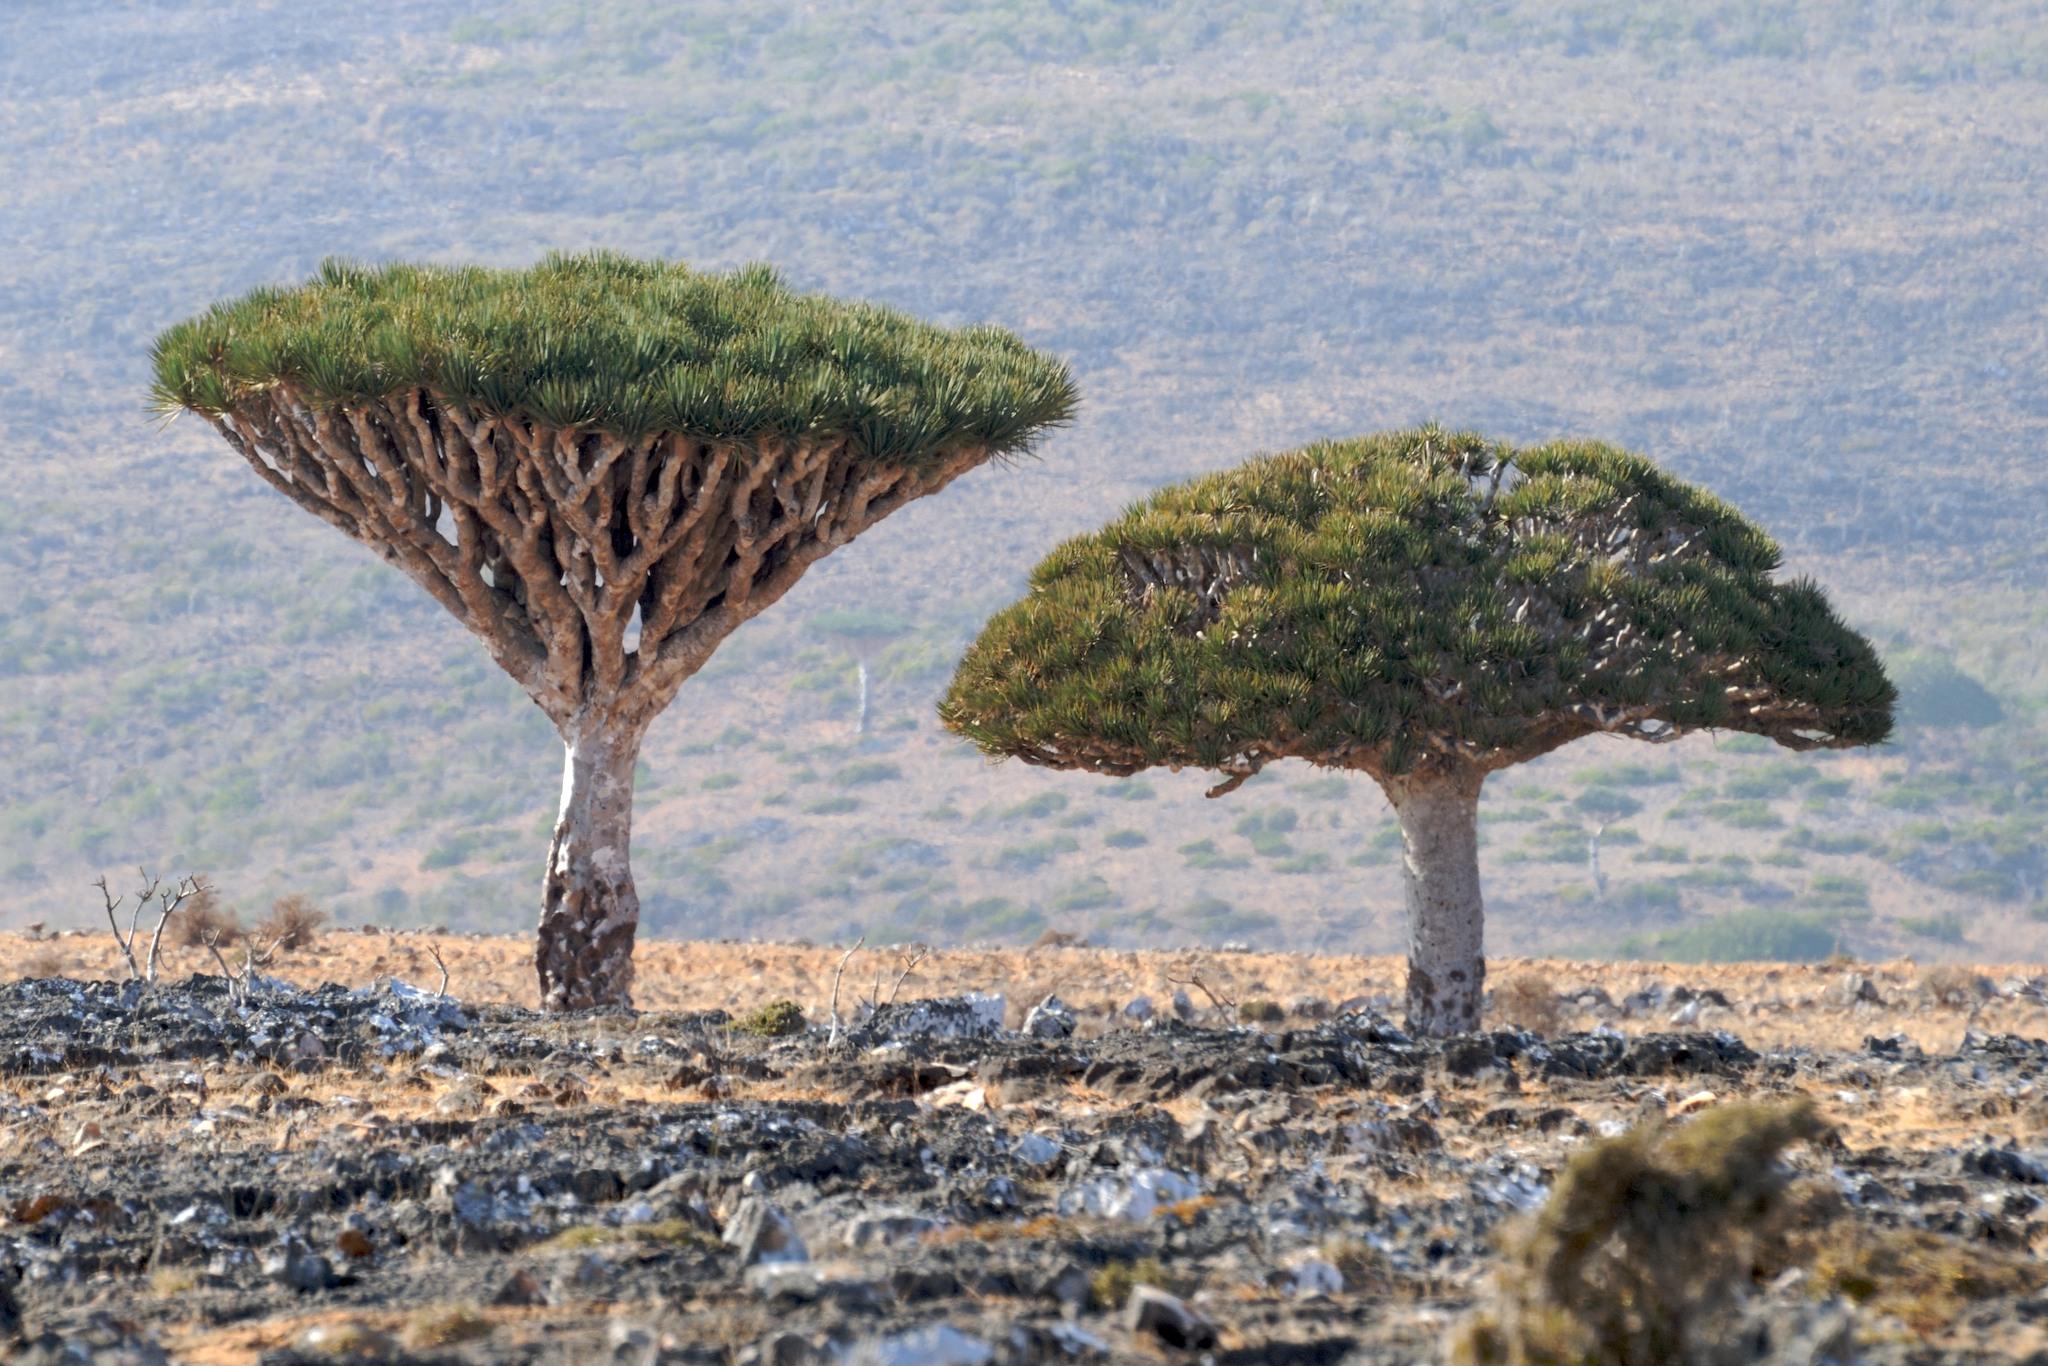 Socotra-island-thesuiteworld-dragon-dracaena-cinnabari-socotra